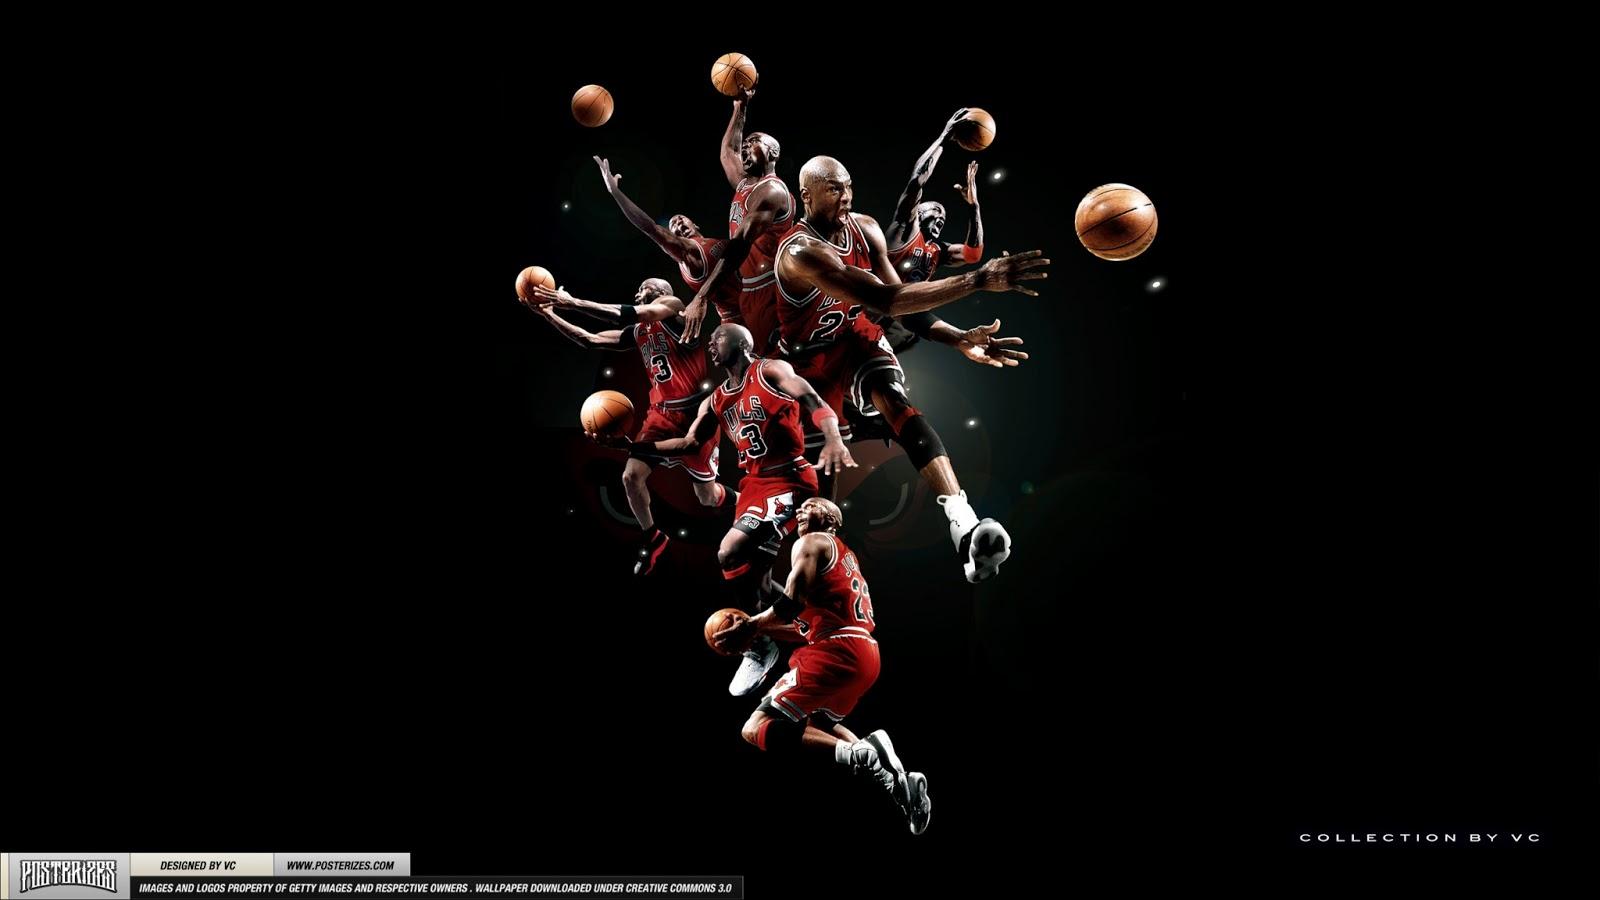 Cool Jordan Wallpapers Wallpapers Background 1600x900